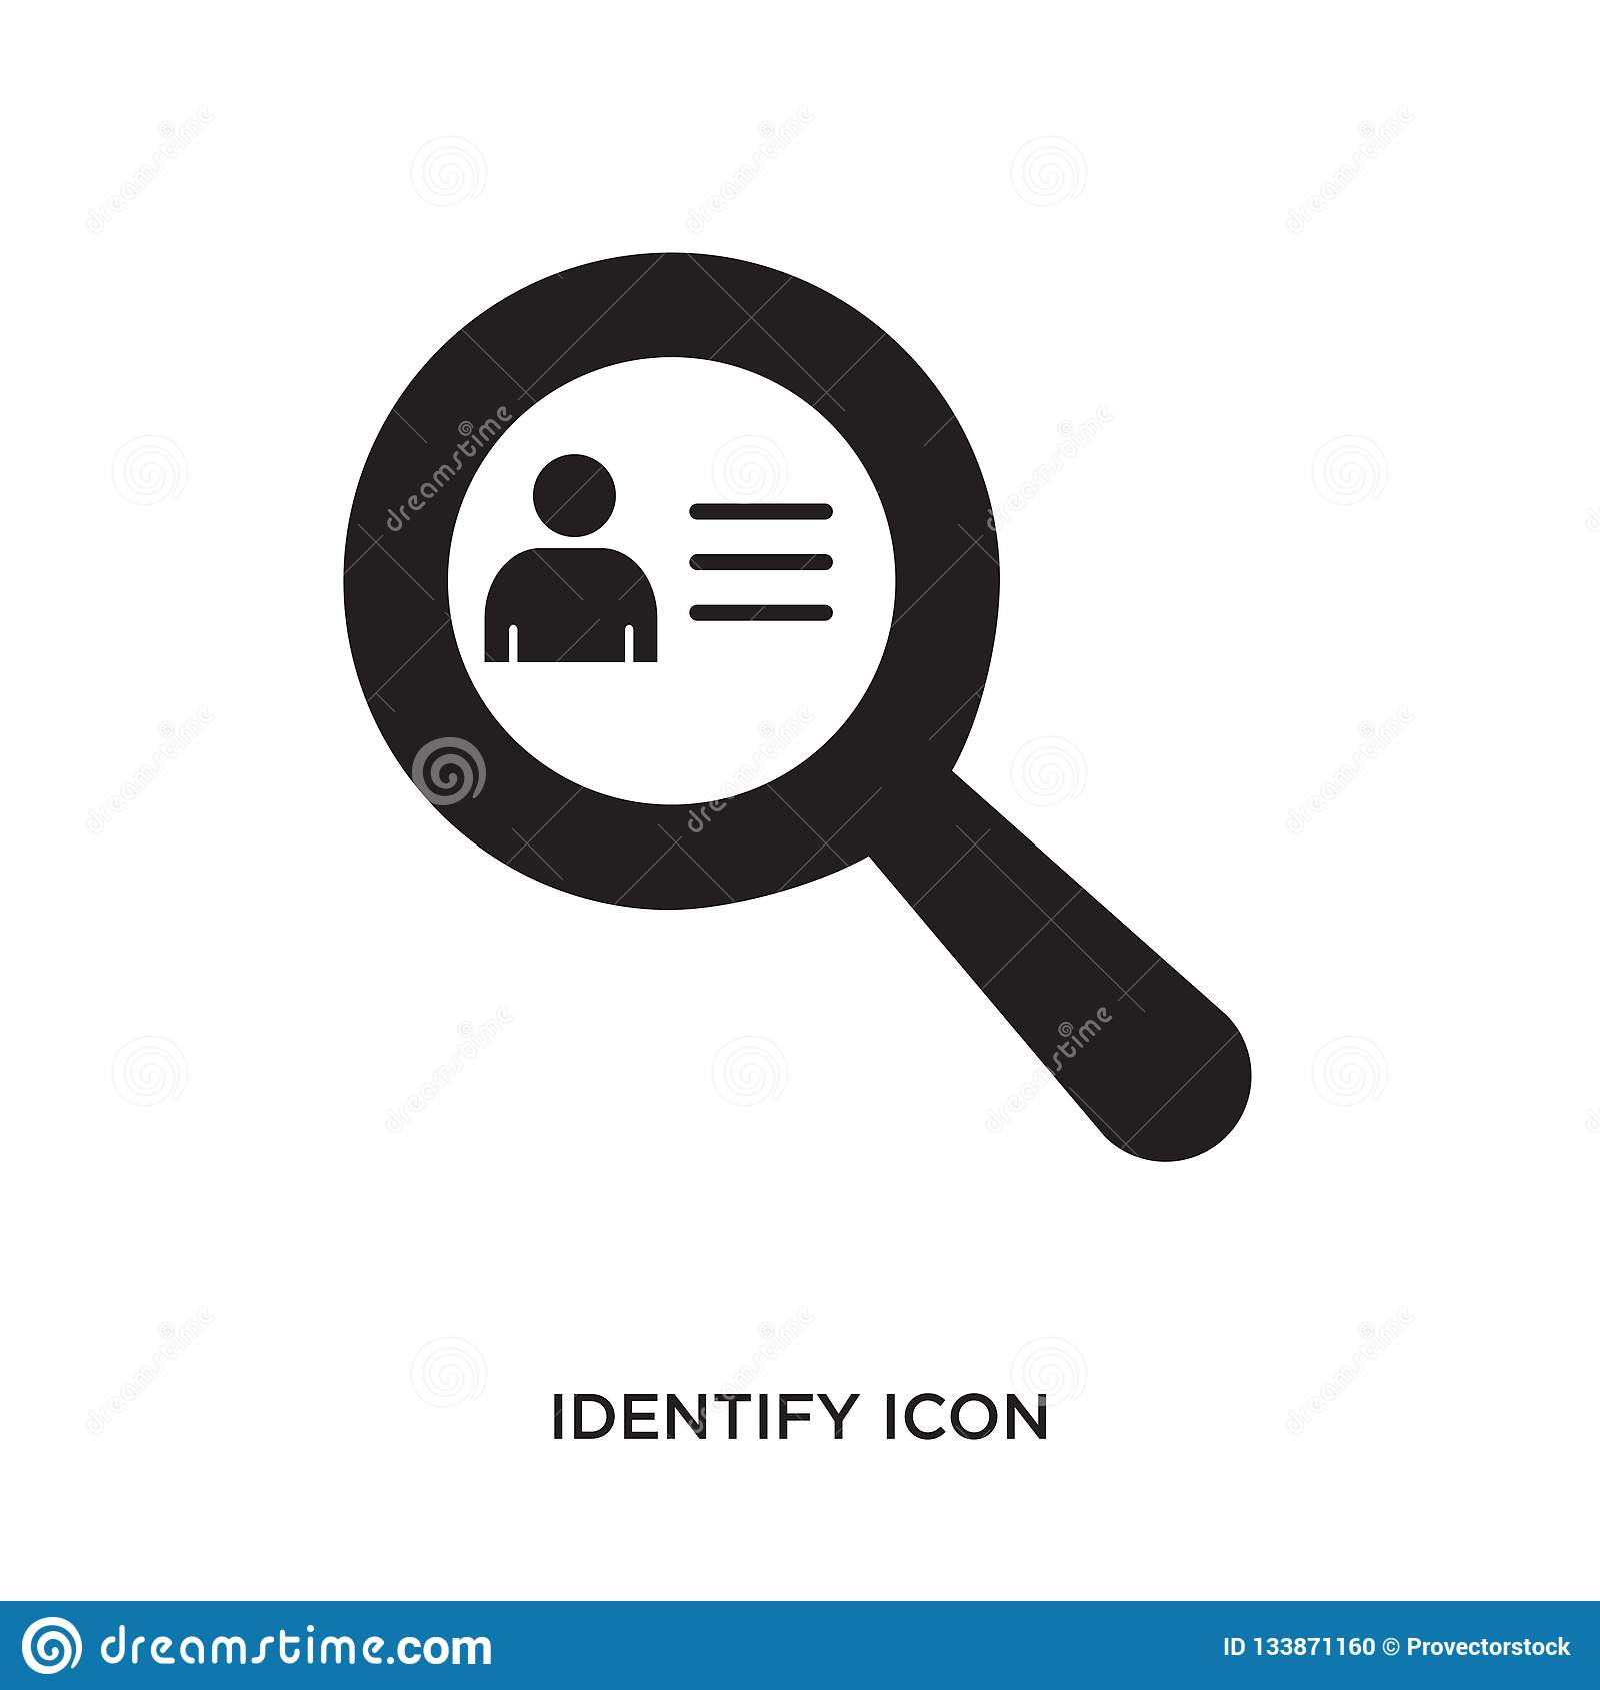 Identify icon stock vector. Illustration of website